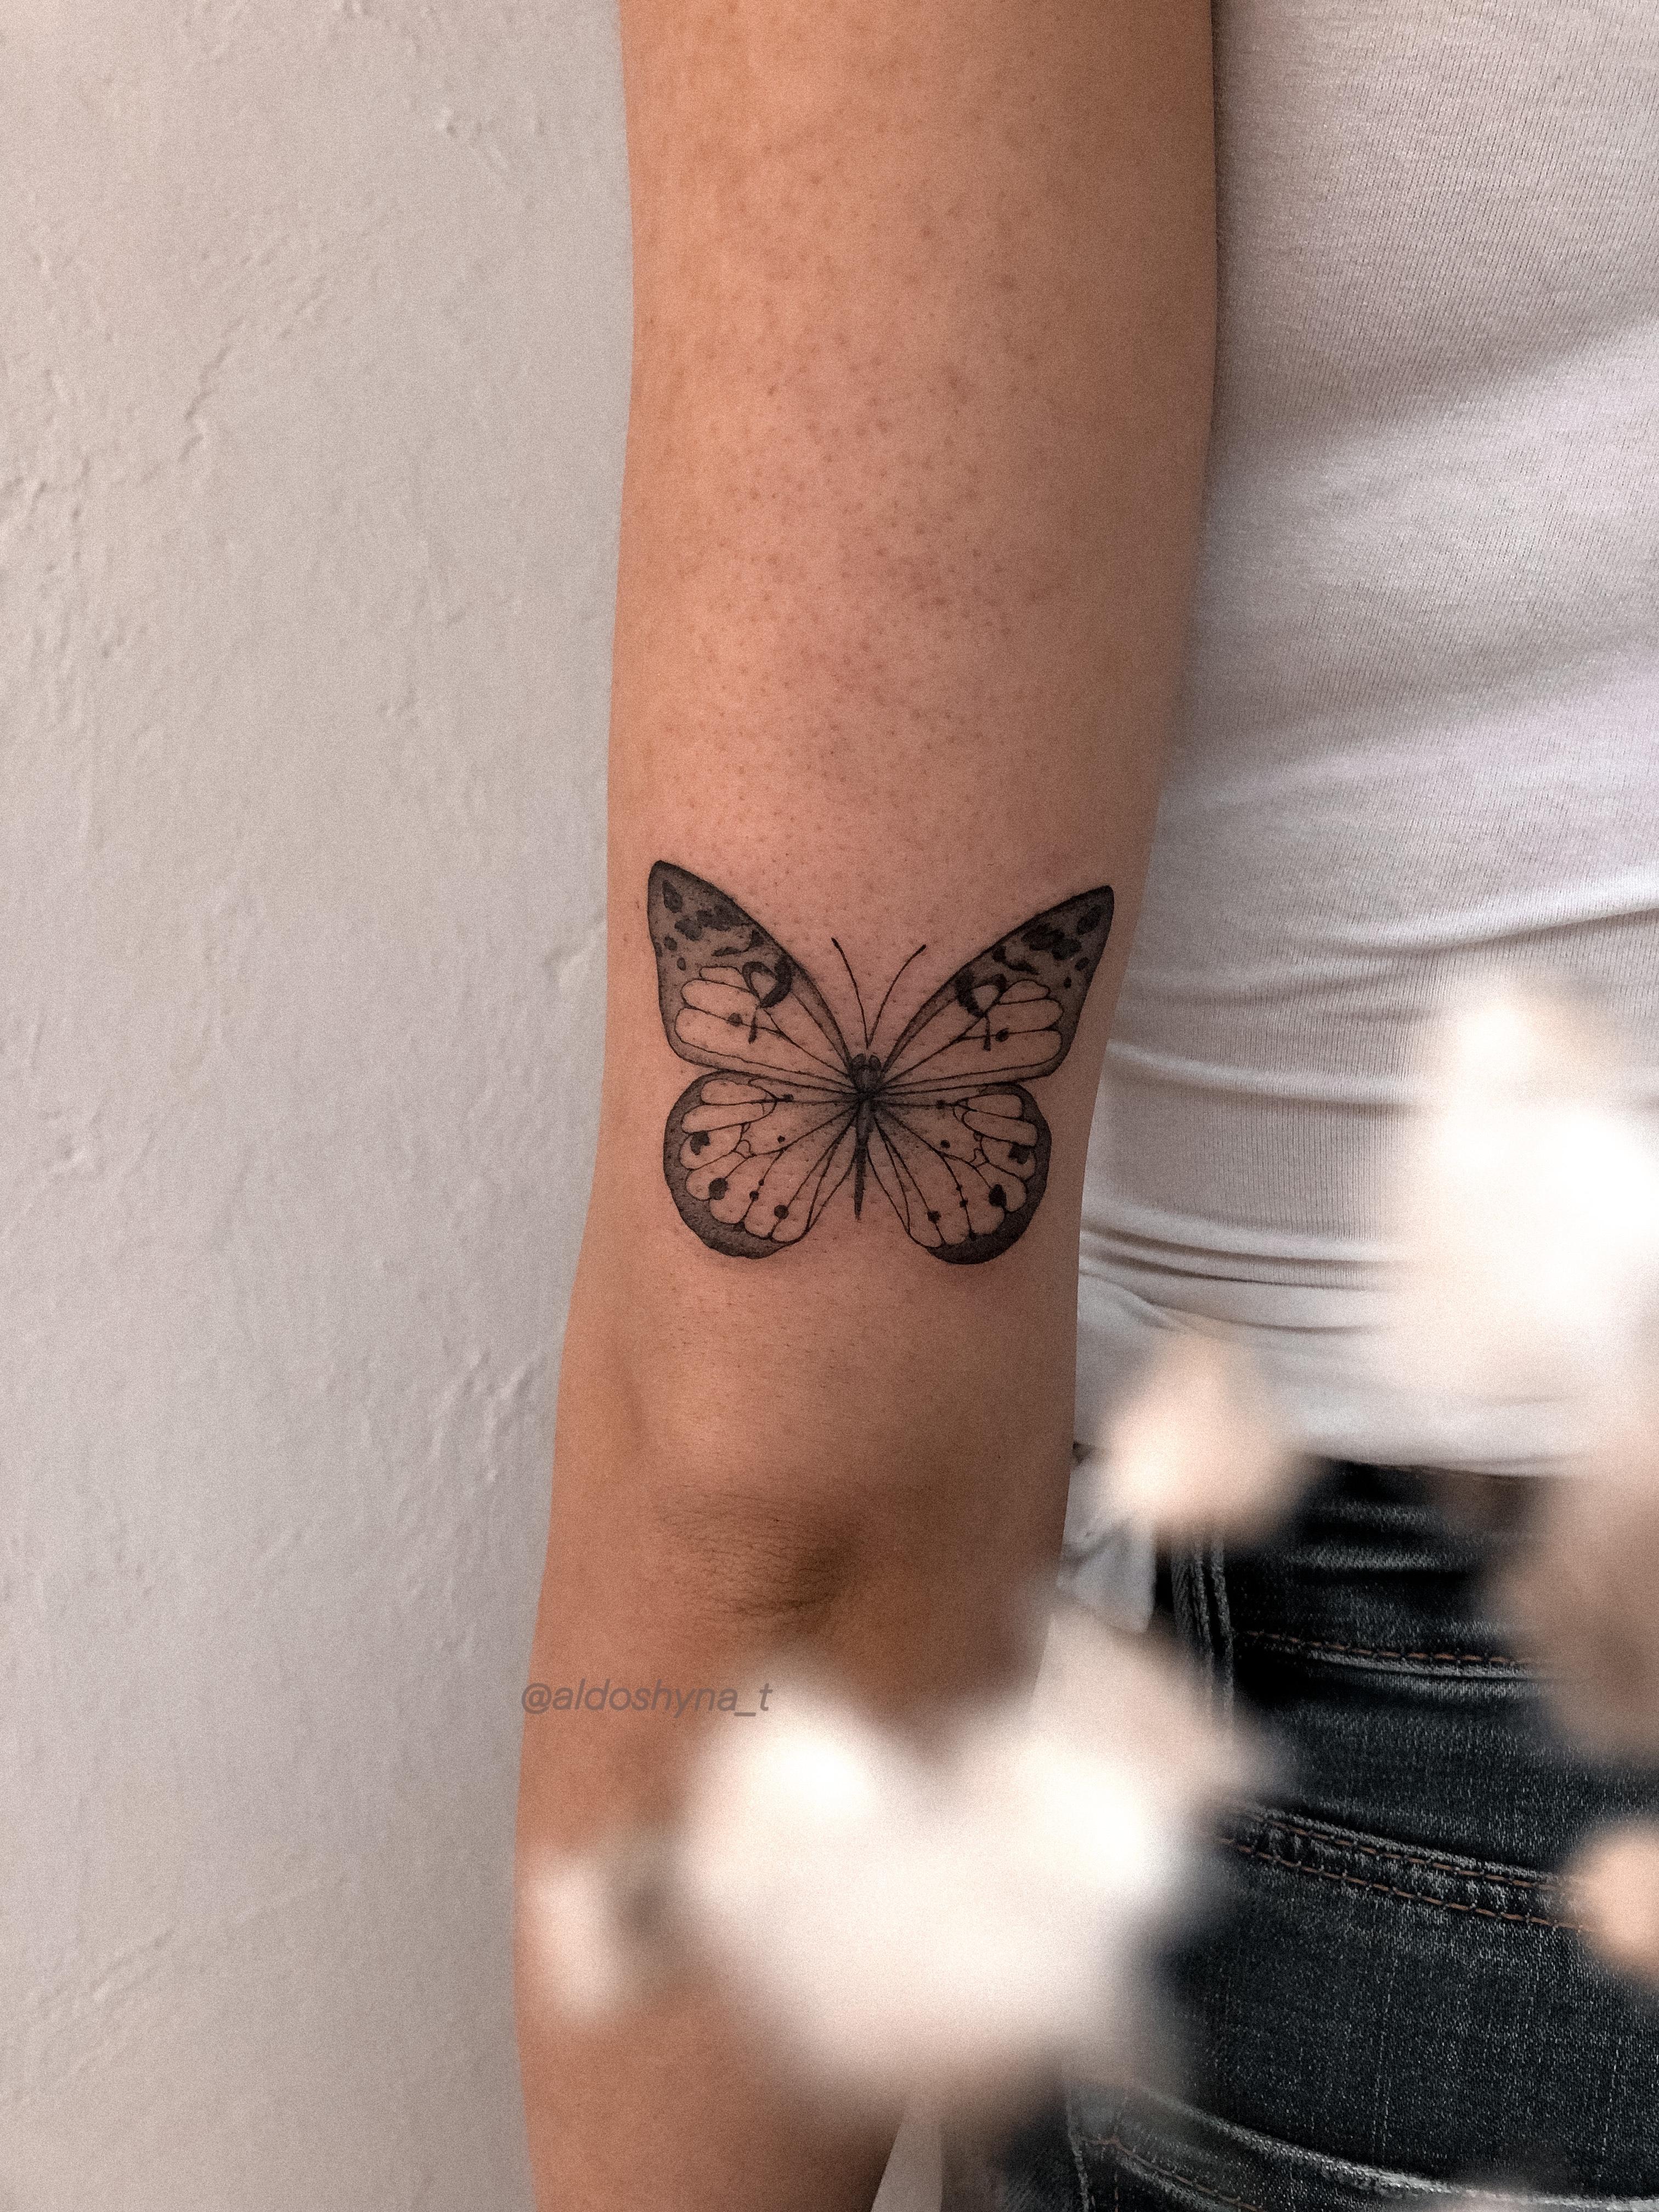 Inksearch tattoo aldoshyna_t